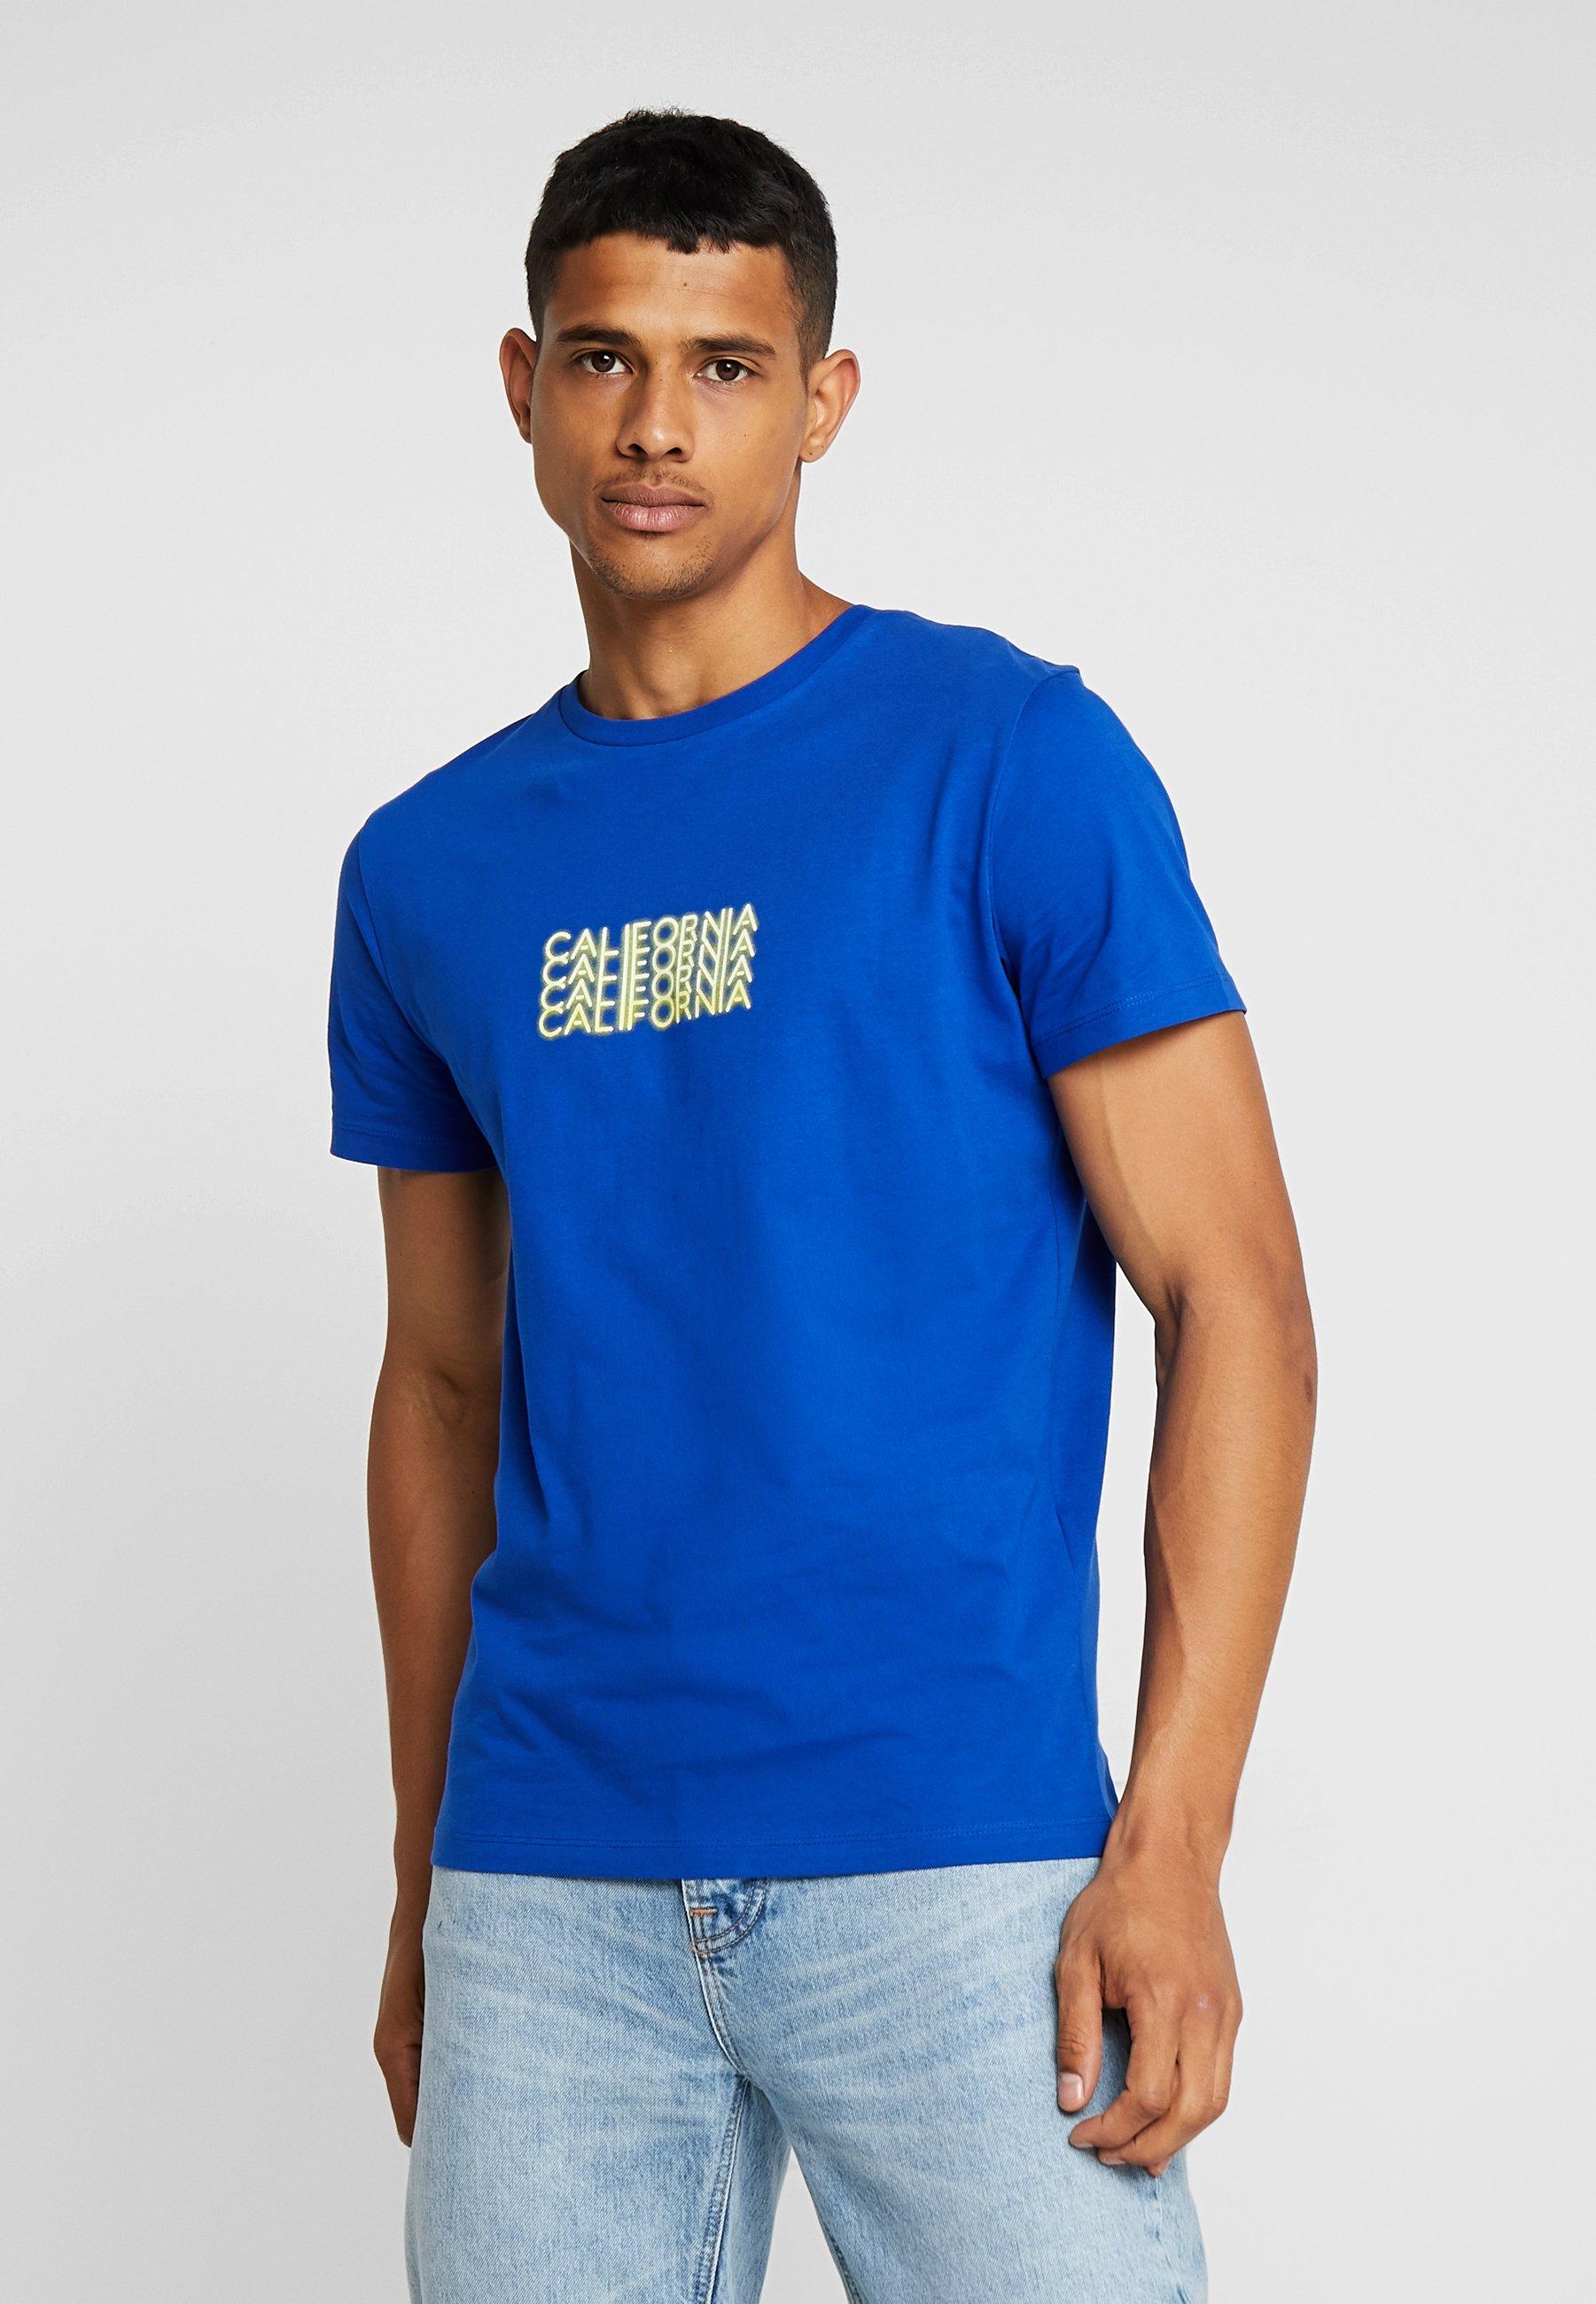 Imprimé shirt Surf Jones Jackamp; Tee Crew NeckT Web Jorsprings The 35RAqjc4L